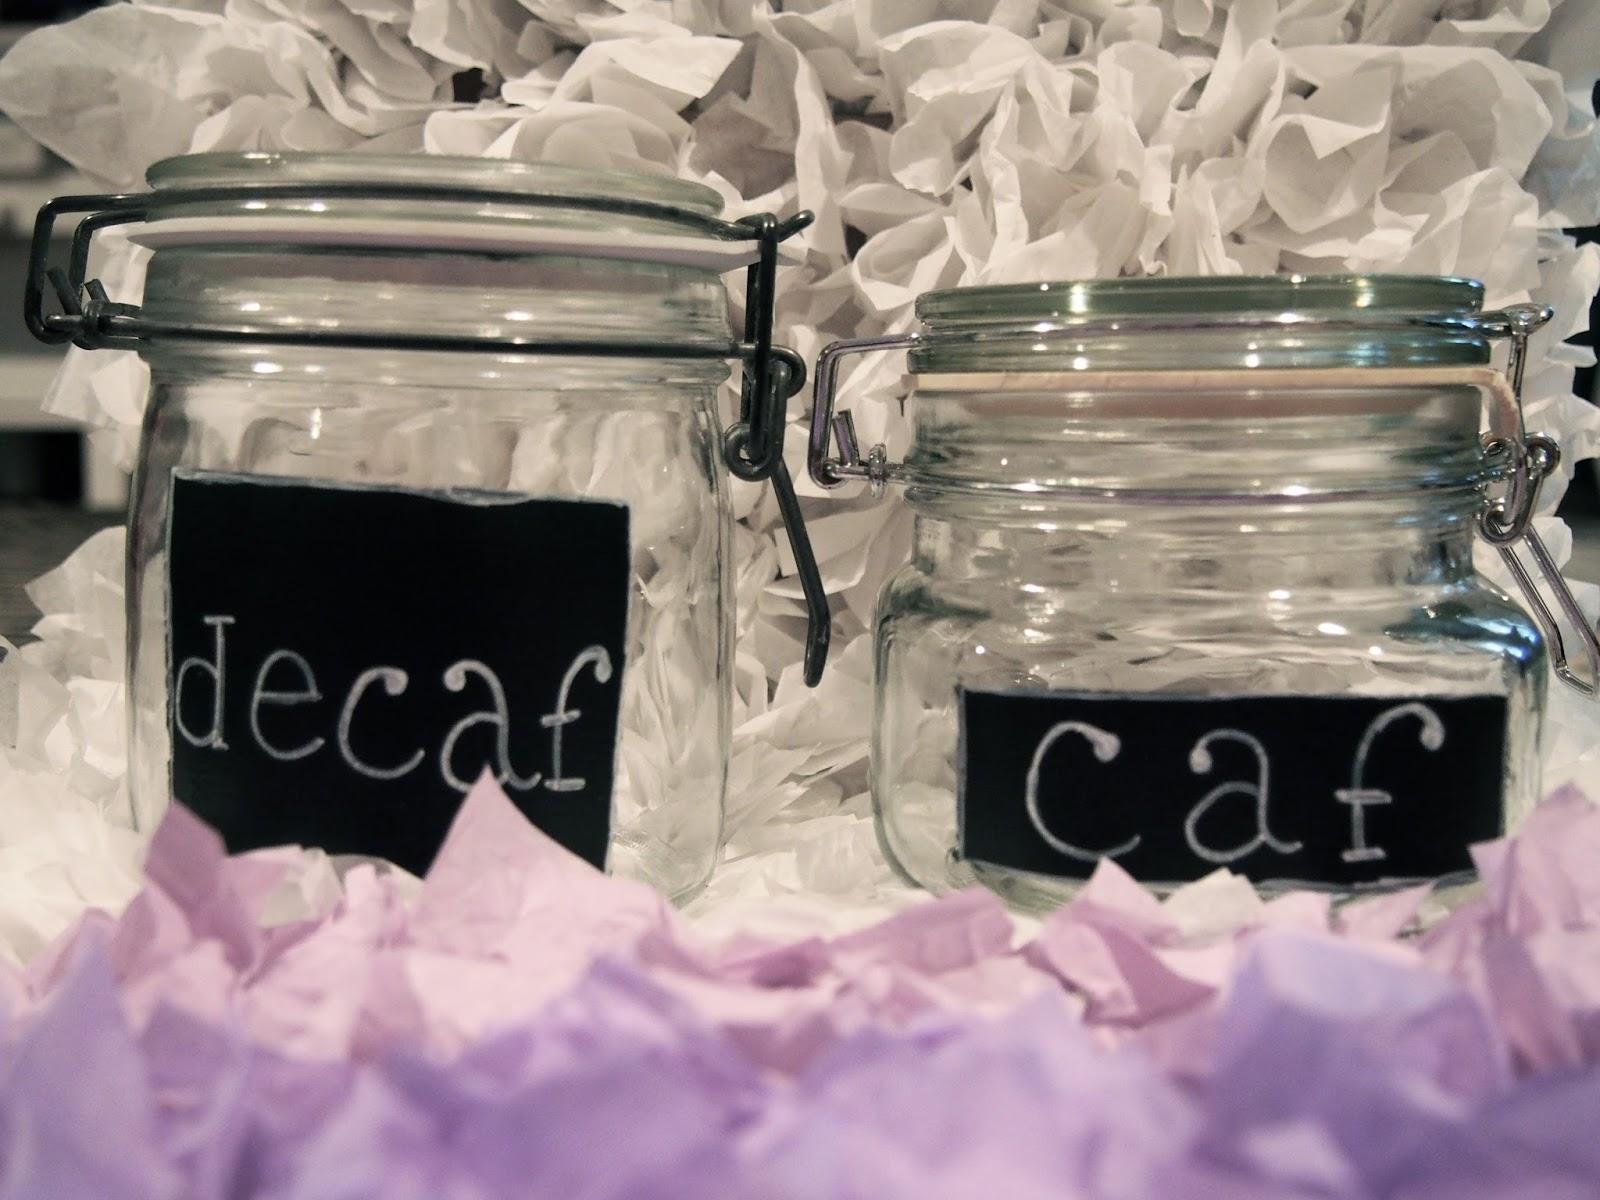 ⓒⓡⓐⓕⓣⓔⓡⓢ ⓑⓔ ⓒⓡⓐⓩⓨ: Glass Jar Labels • Rock